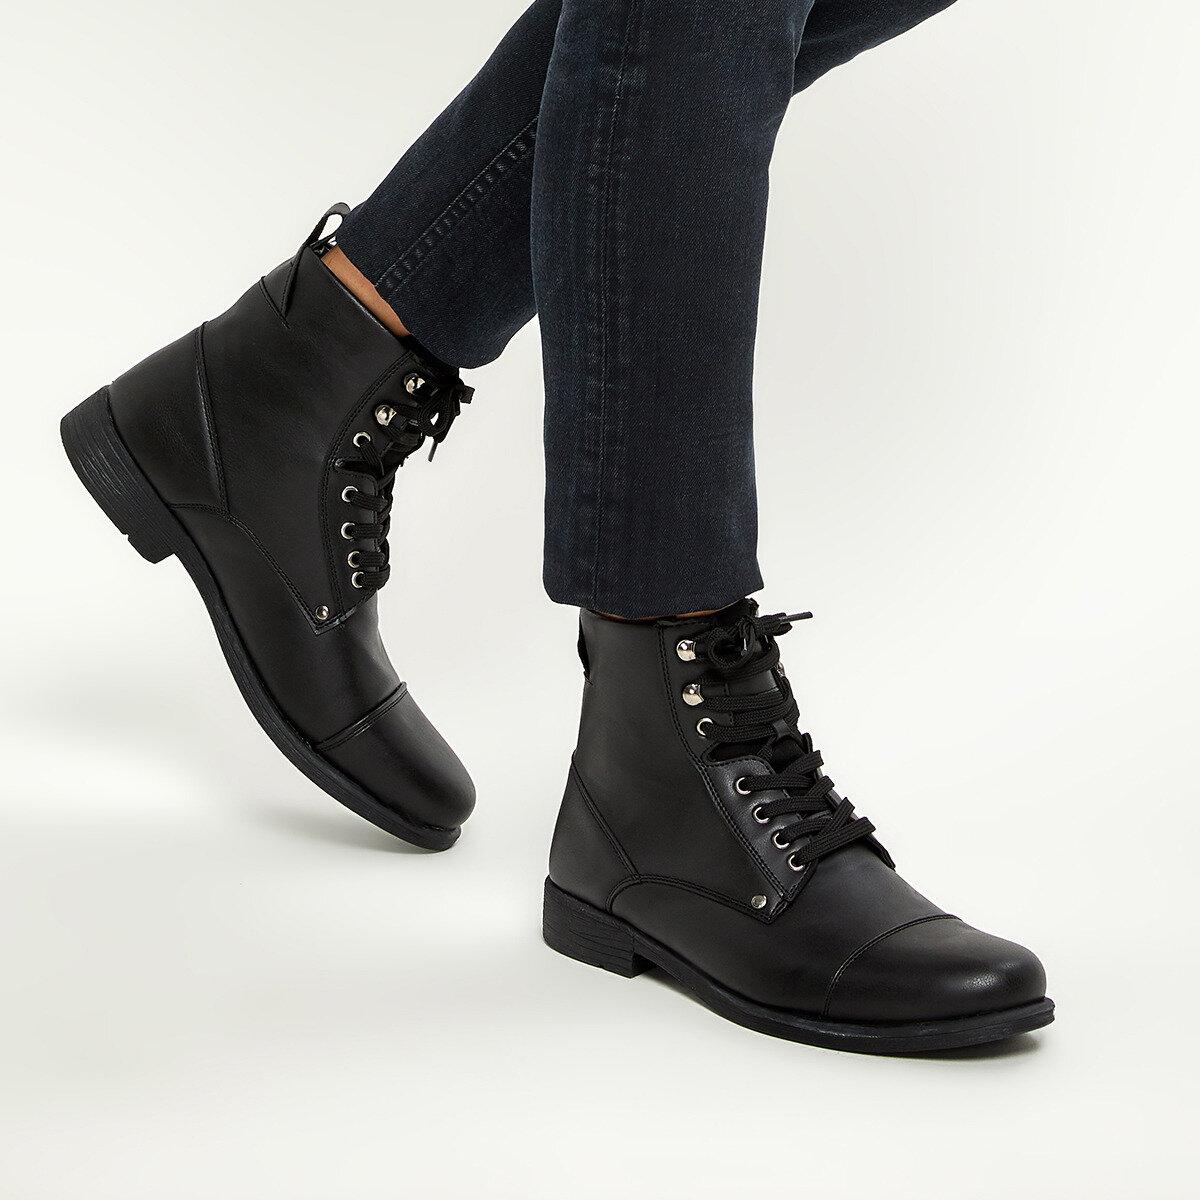 FLO FL-B-7000 Black Men Boots JJ-Stiller